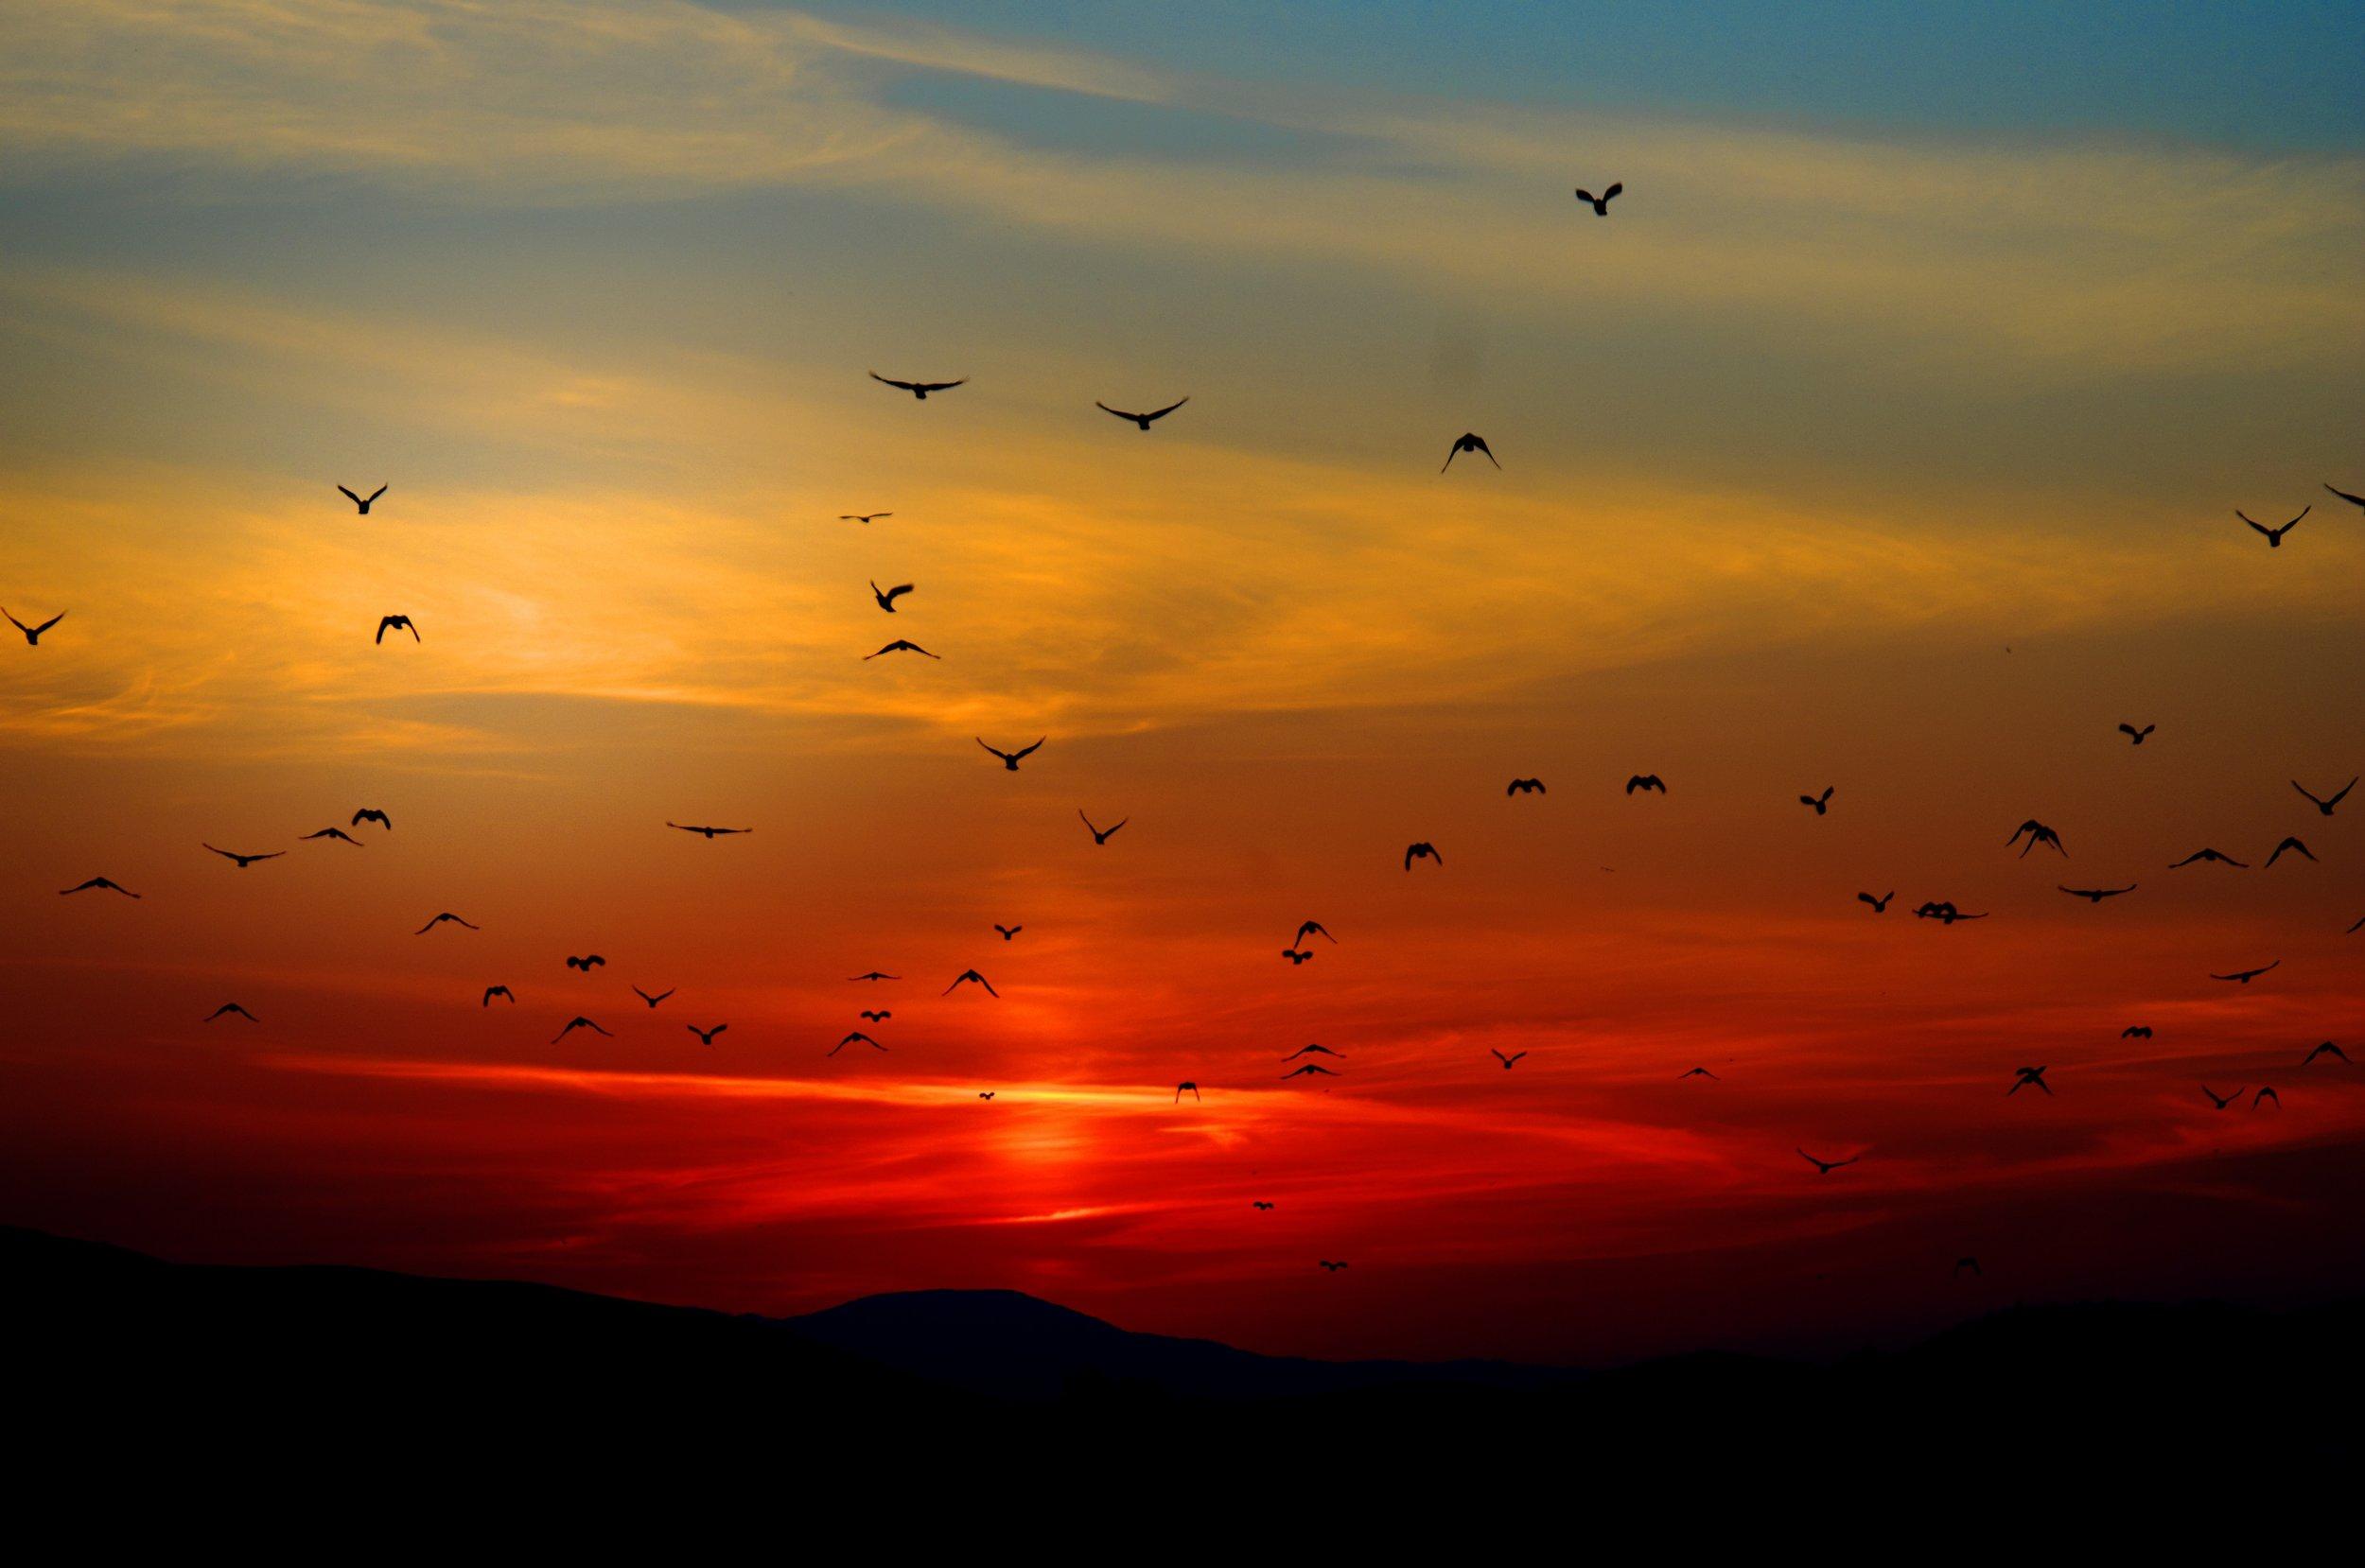 sunset-birds-flying-sky-70577.jpeg